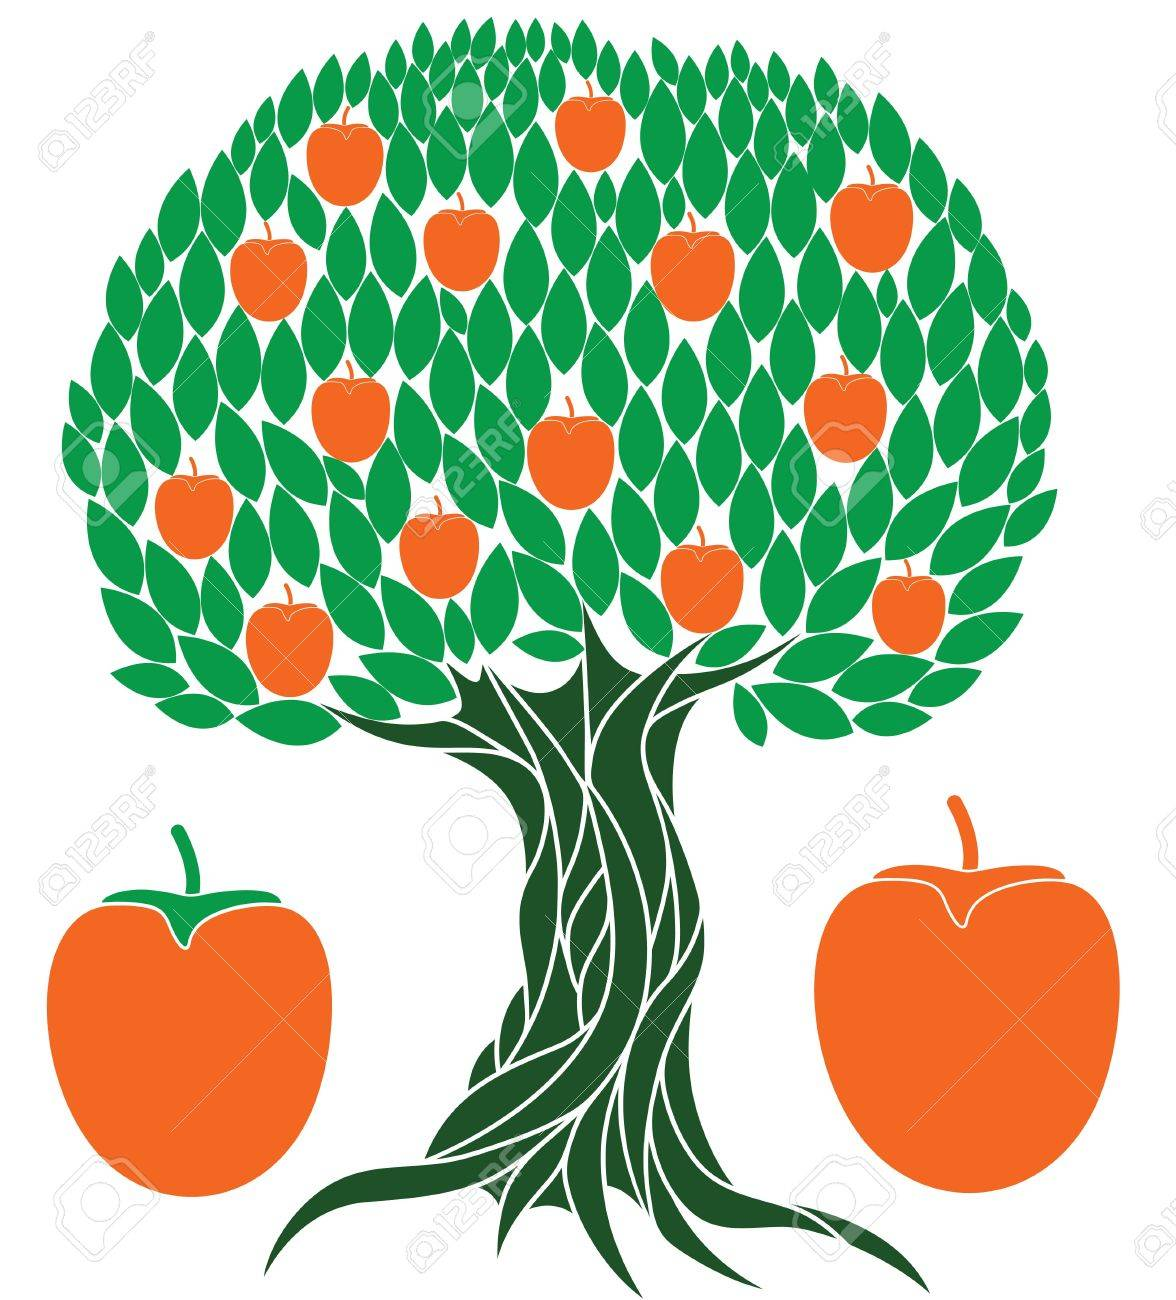 Persimmon tree illustration Stock Vector - 33203054